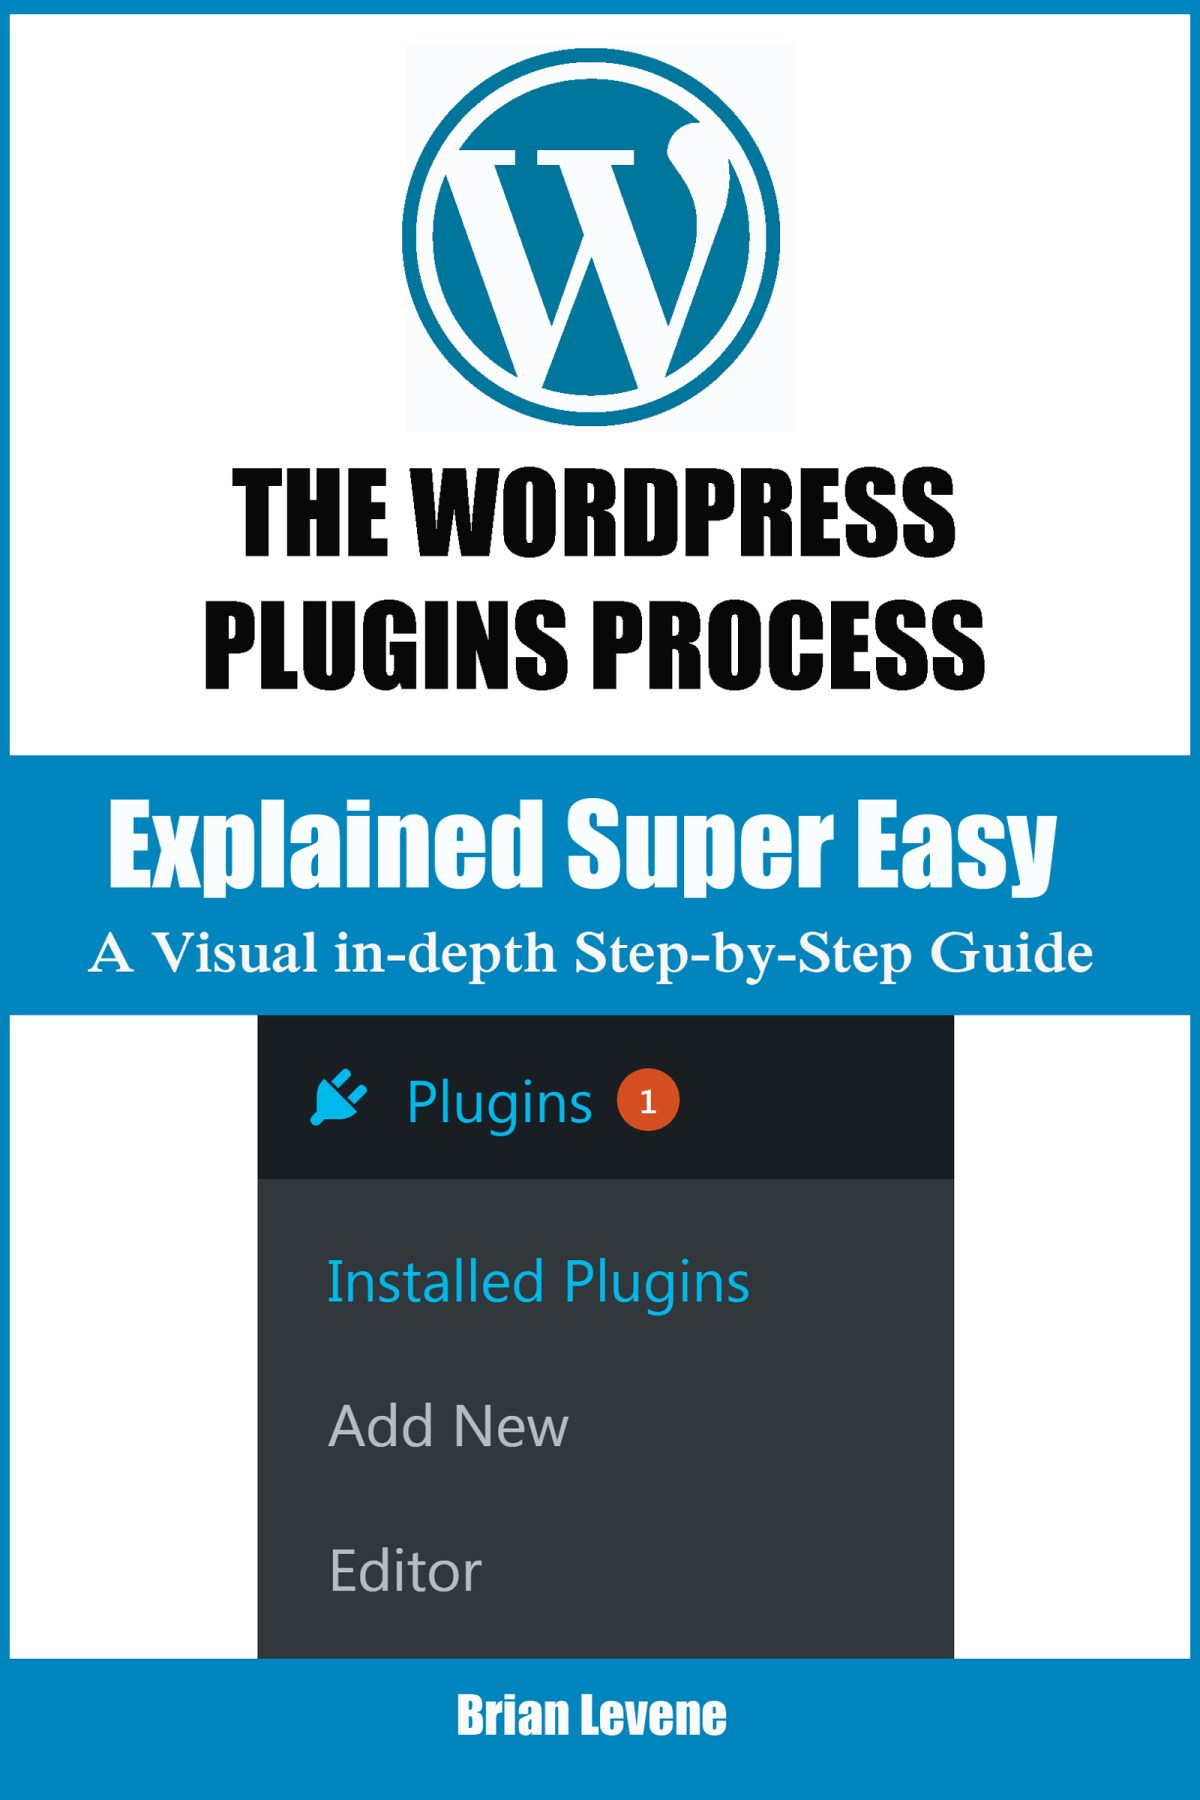 My new ebook about wordpress plugins